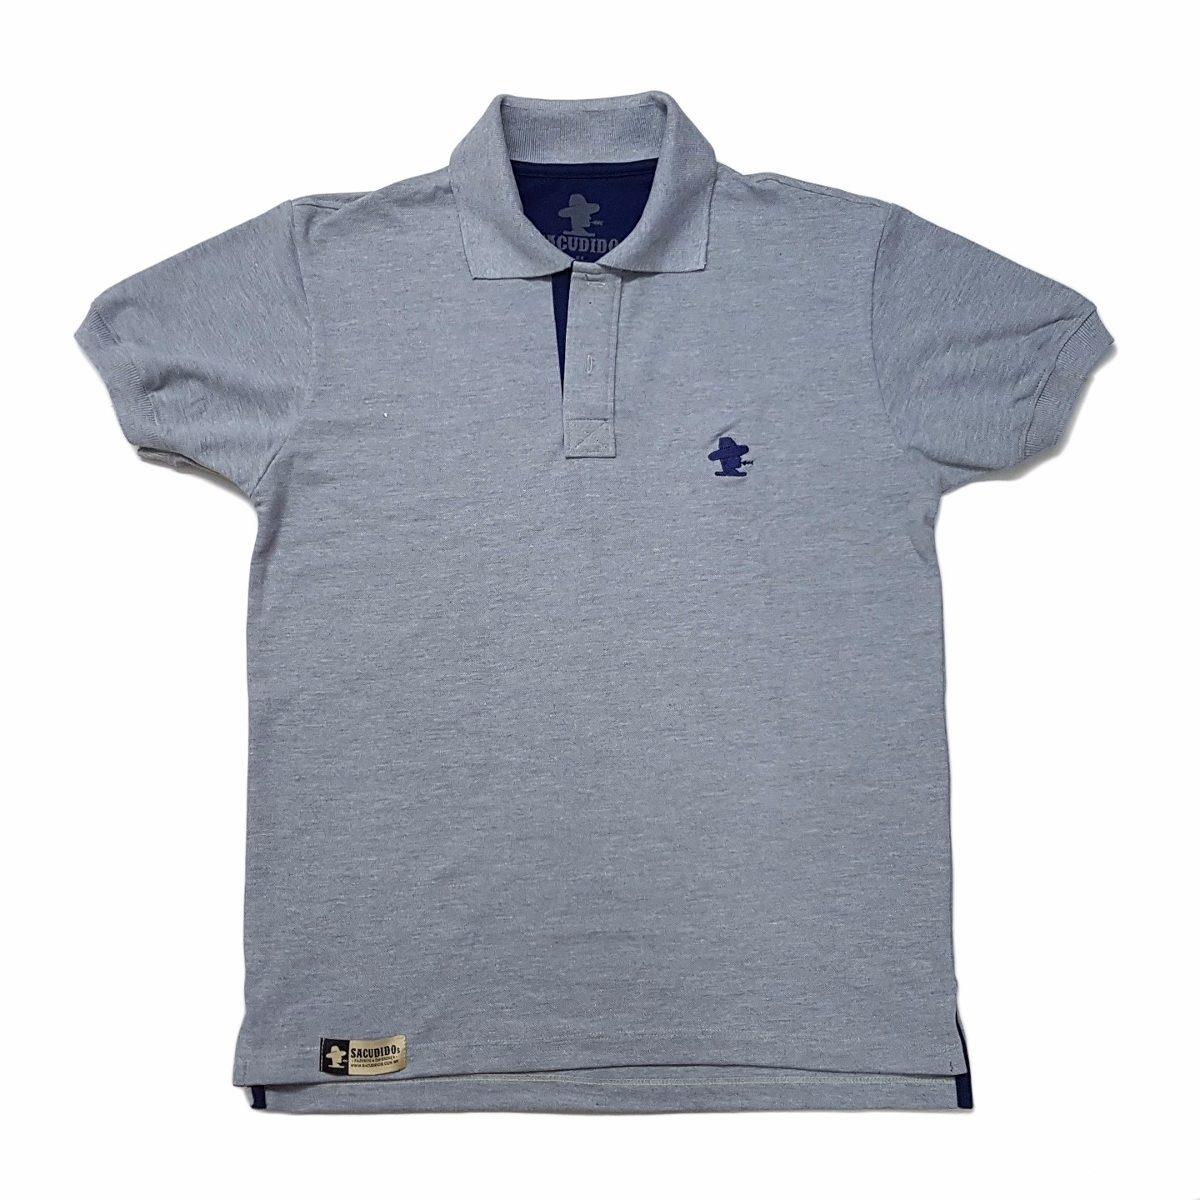 Camiseta Polo Sacudido s - Cinza E Azul - R  109 6e369d8c40b41